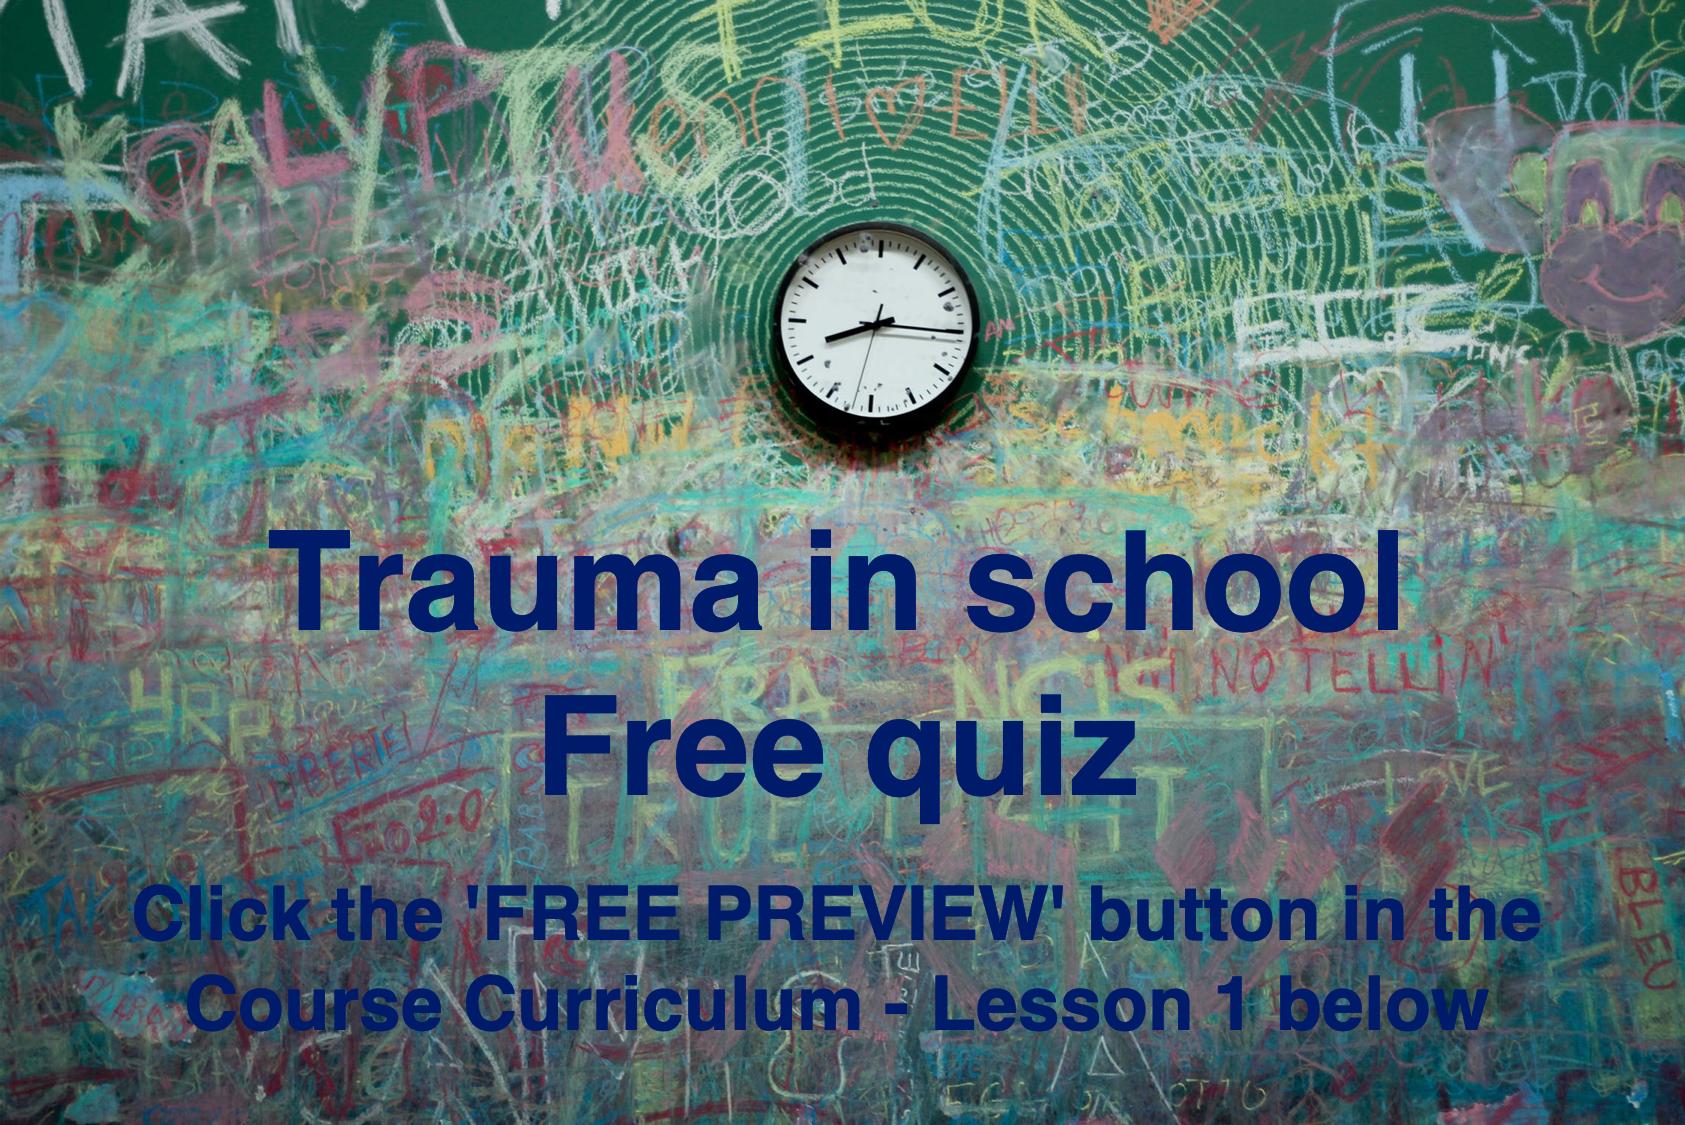 Free trial - Quiz